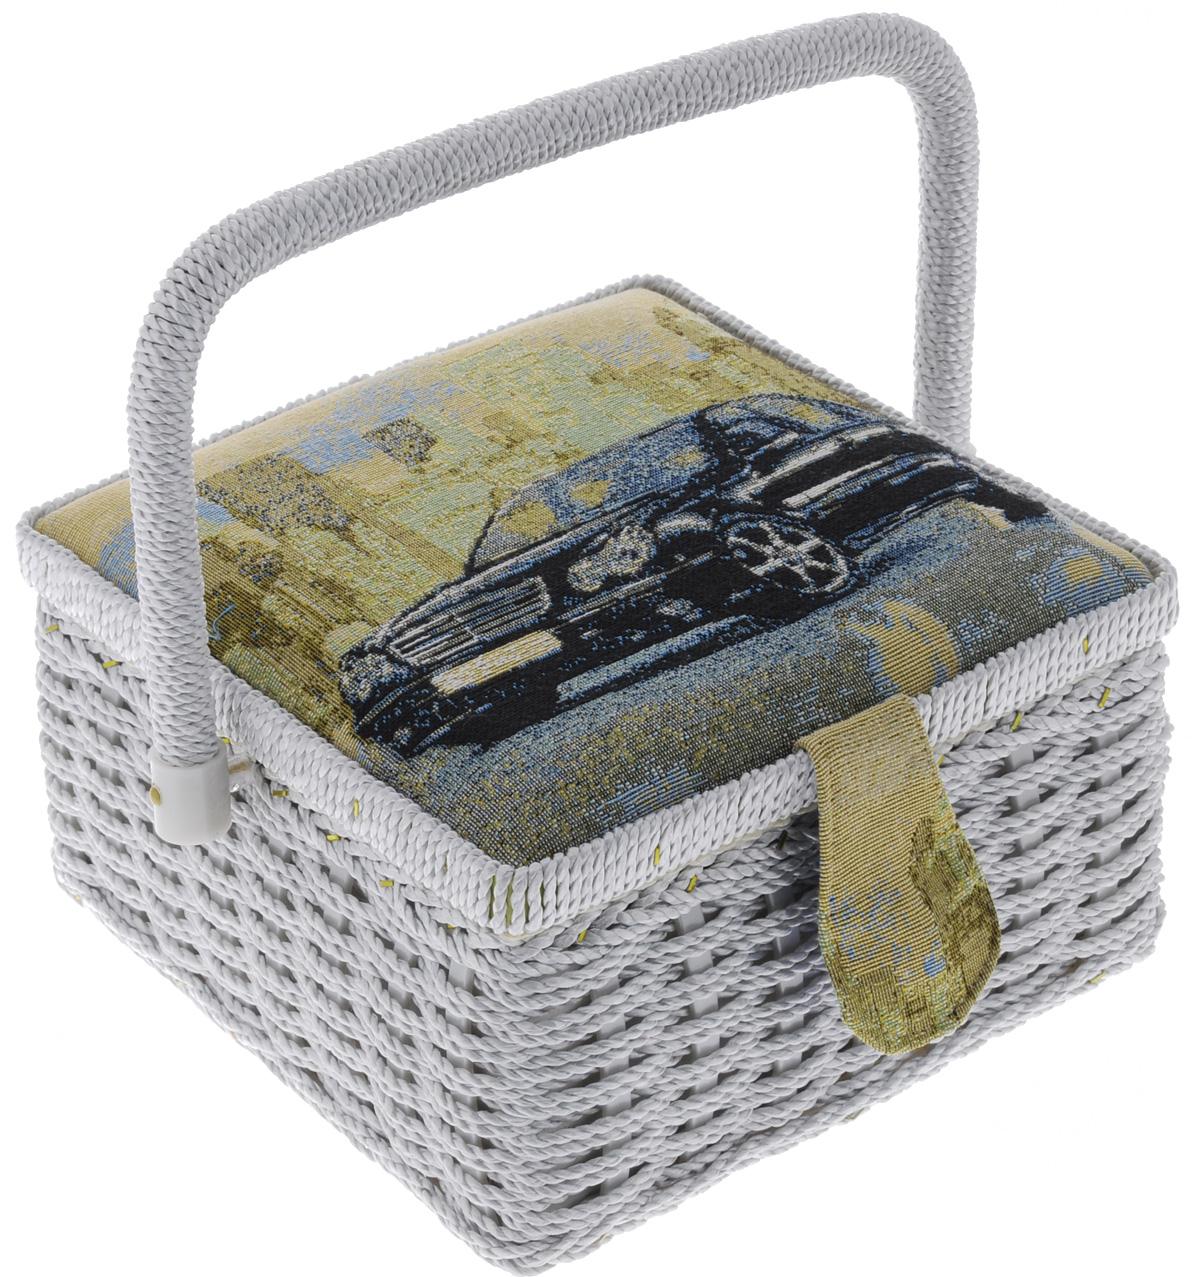 Шкатулка для рукоделия RTO Автомобиль, с вкладышем, 20 х 20 х 11 см шкатулка для бижутерии восьмиугольная 20 х 13 х 8 см